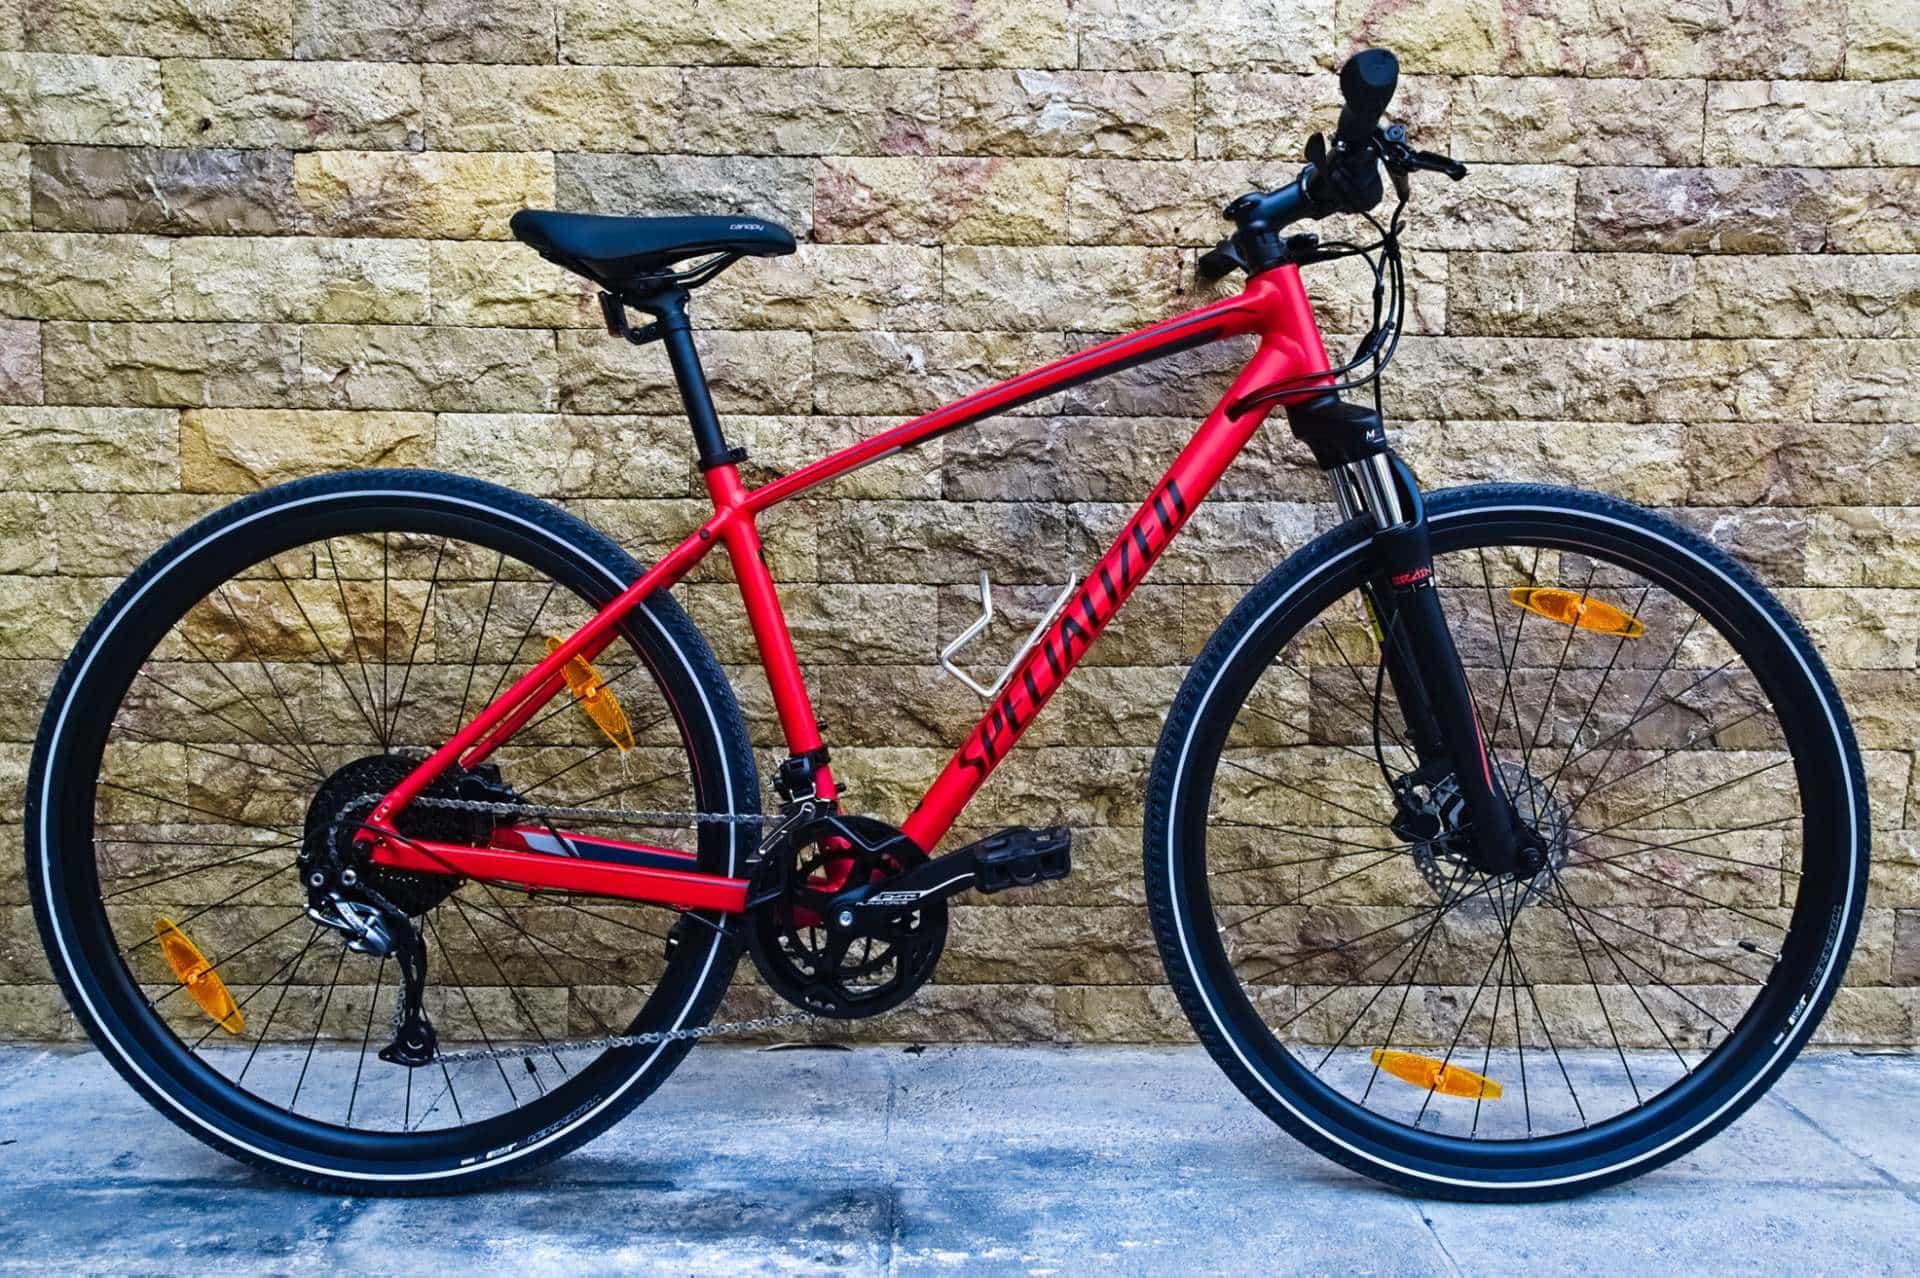 Specialized Crosstrail Fitness Bike Grcycling Rentals